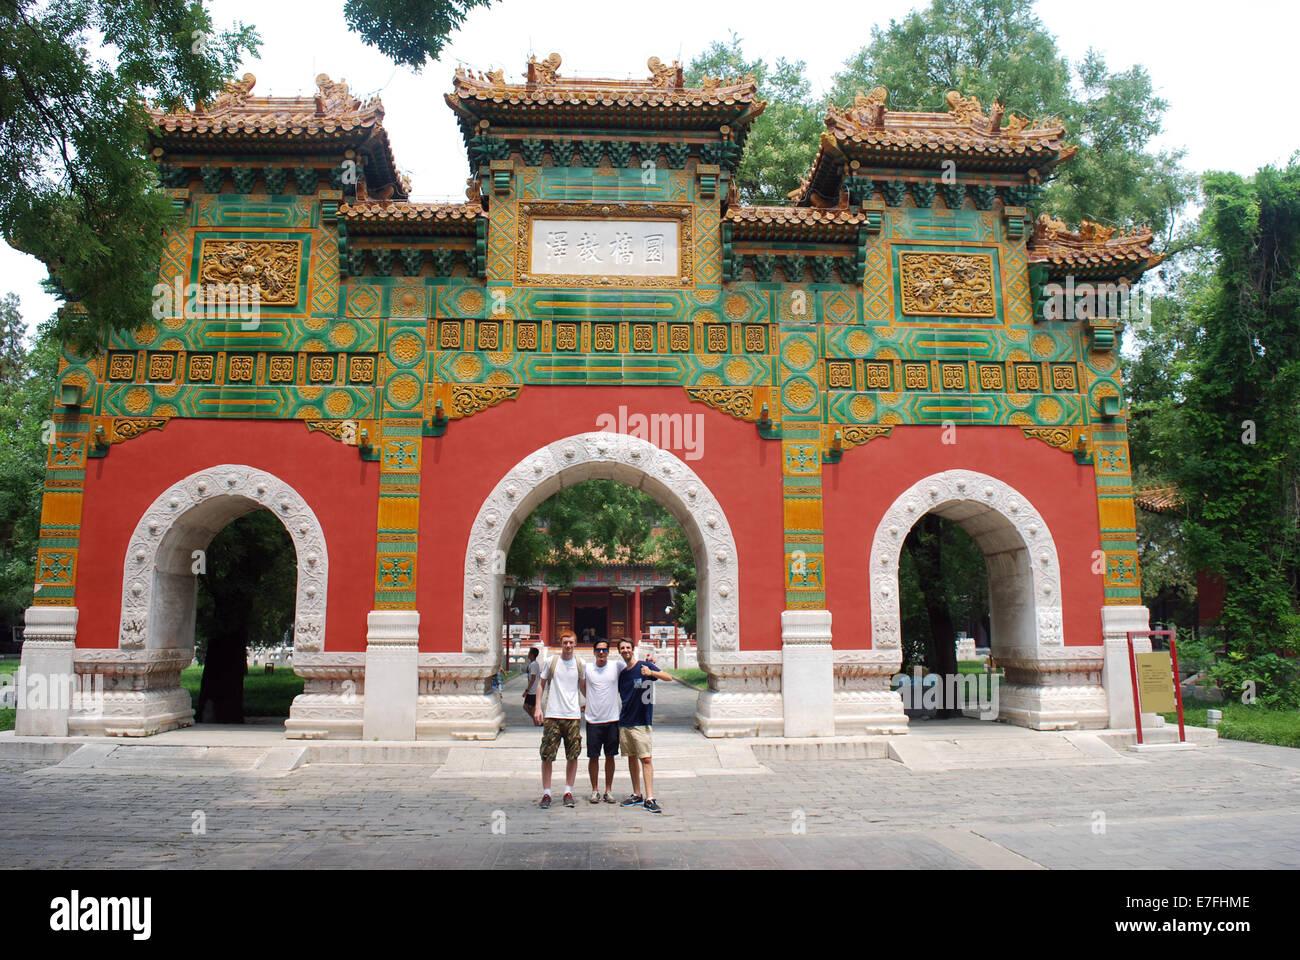 Westliche Schüler, Konfuzius Tempel Peking 2014 Stockbild